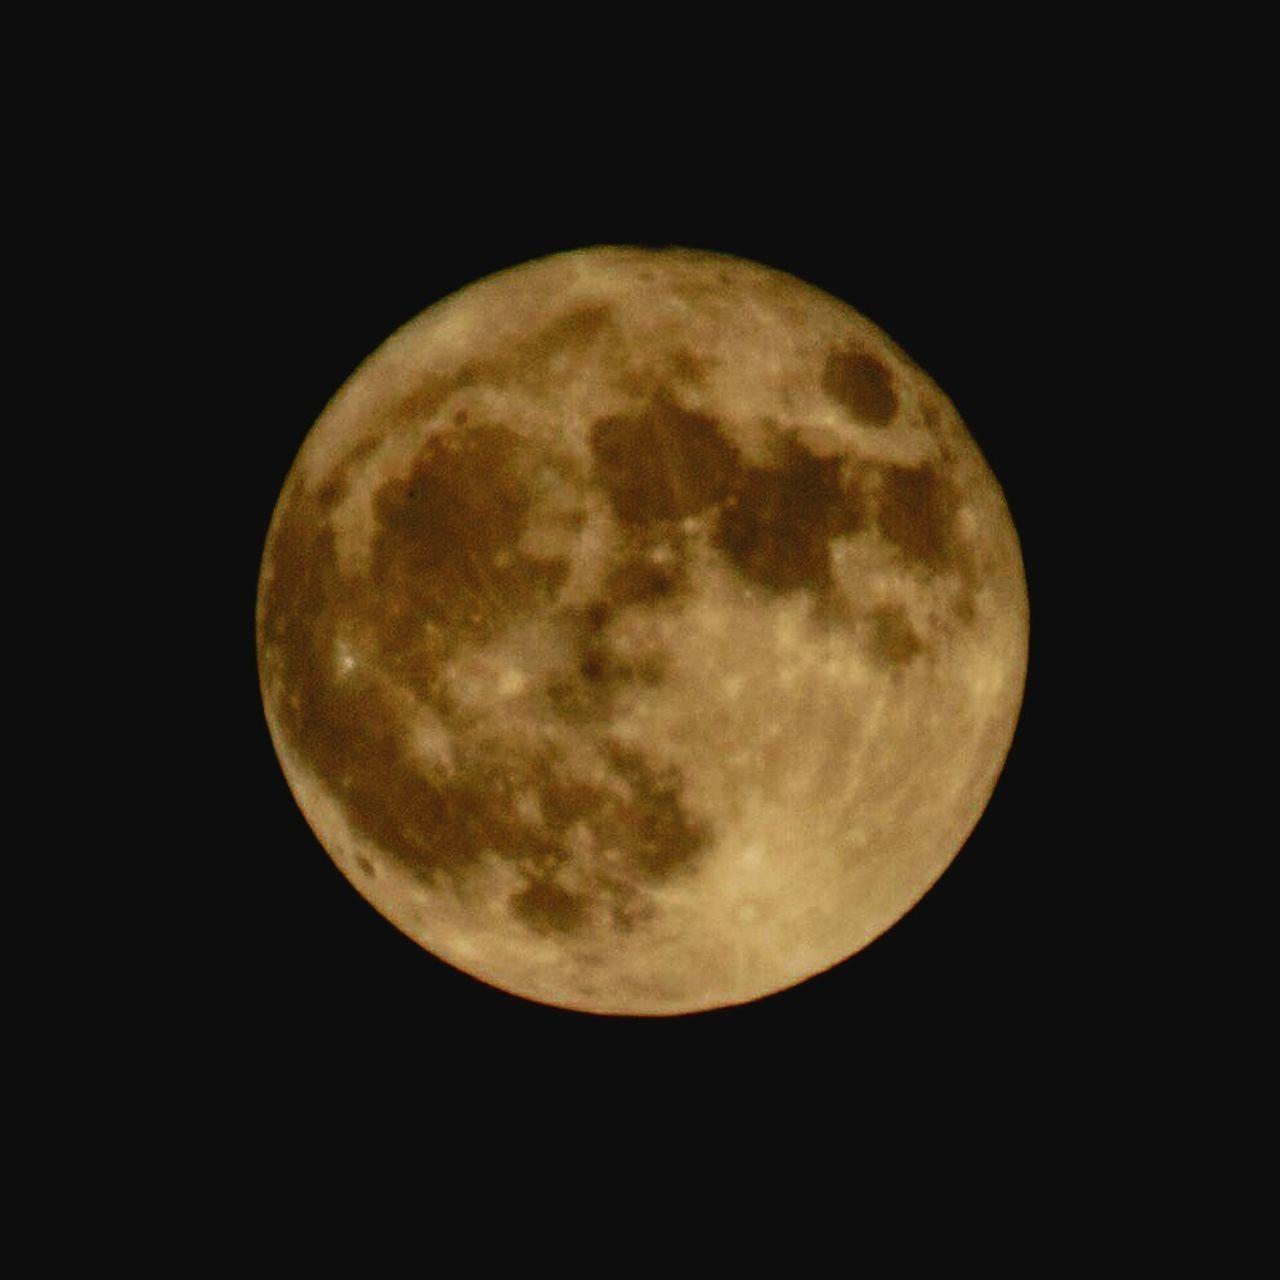 Night Full Moon No People Moon Surface